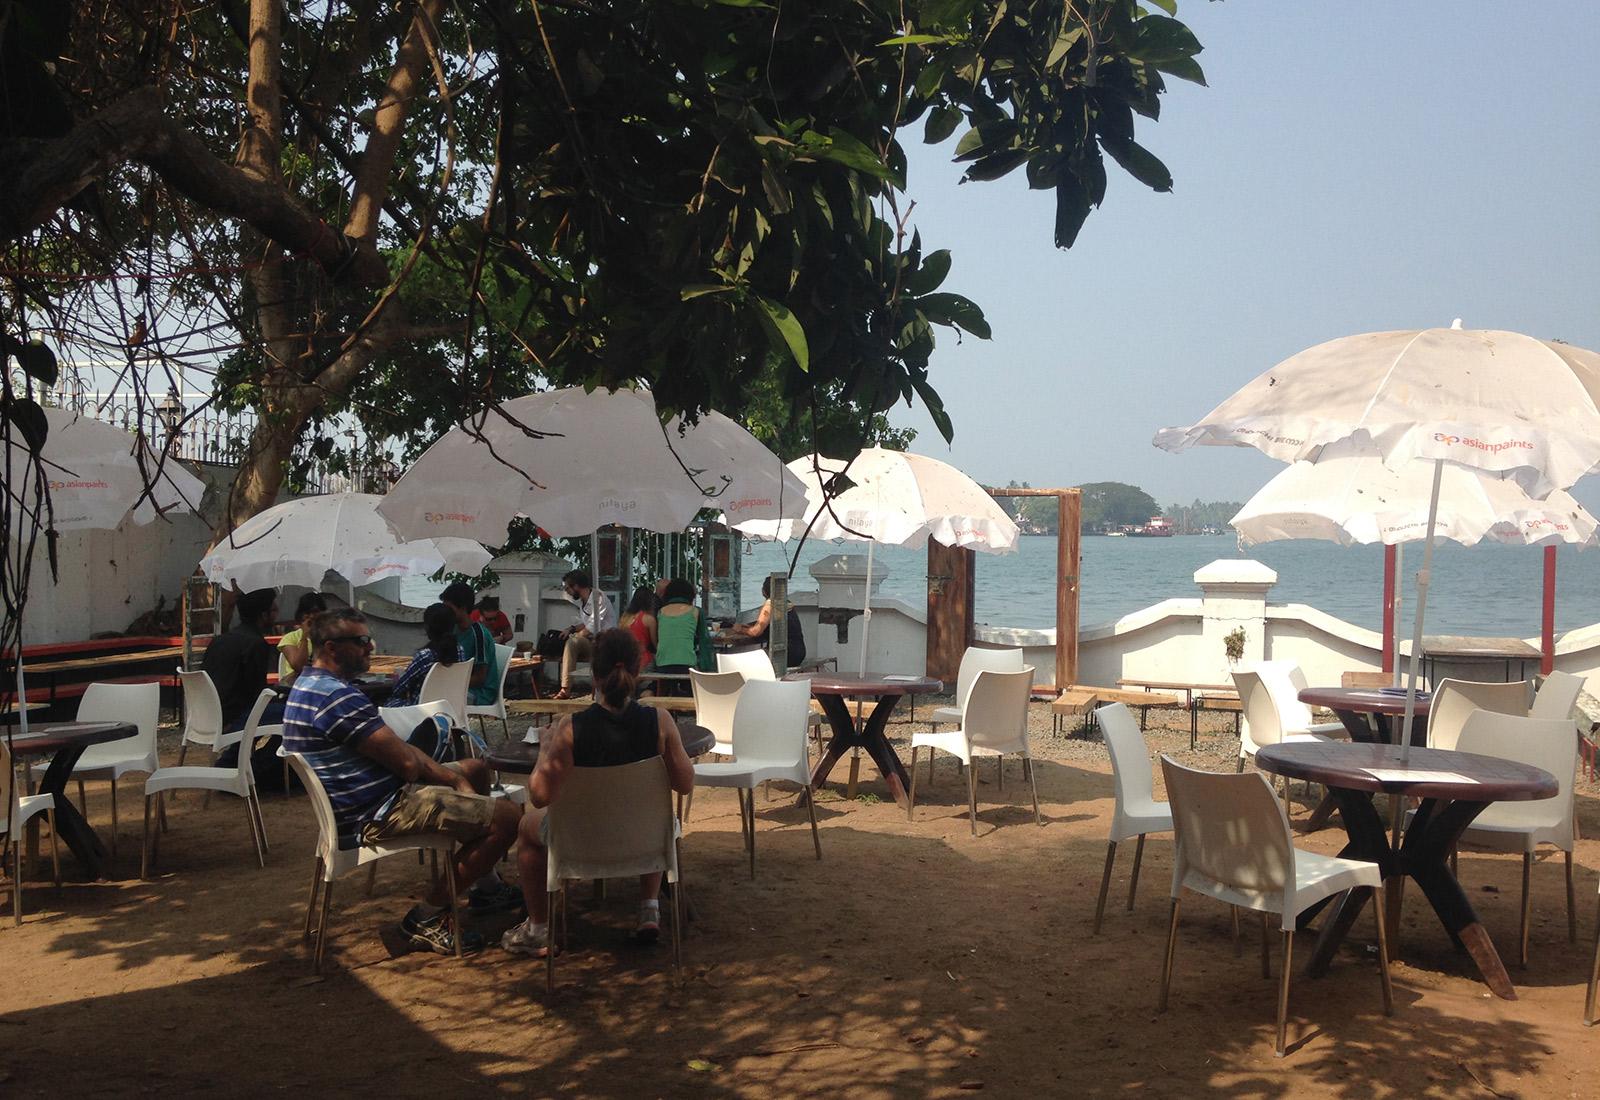 Biennale-Cafe